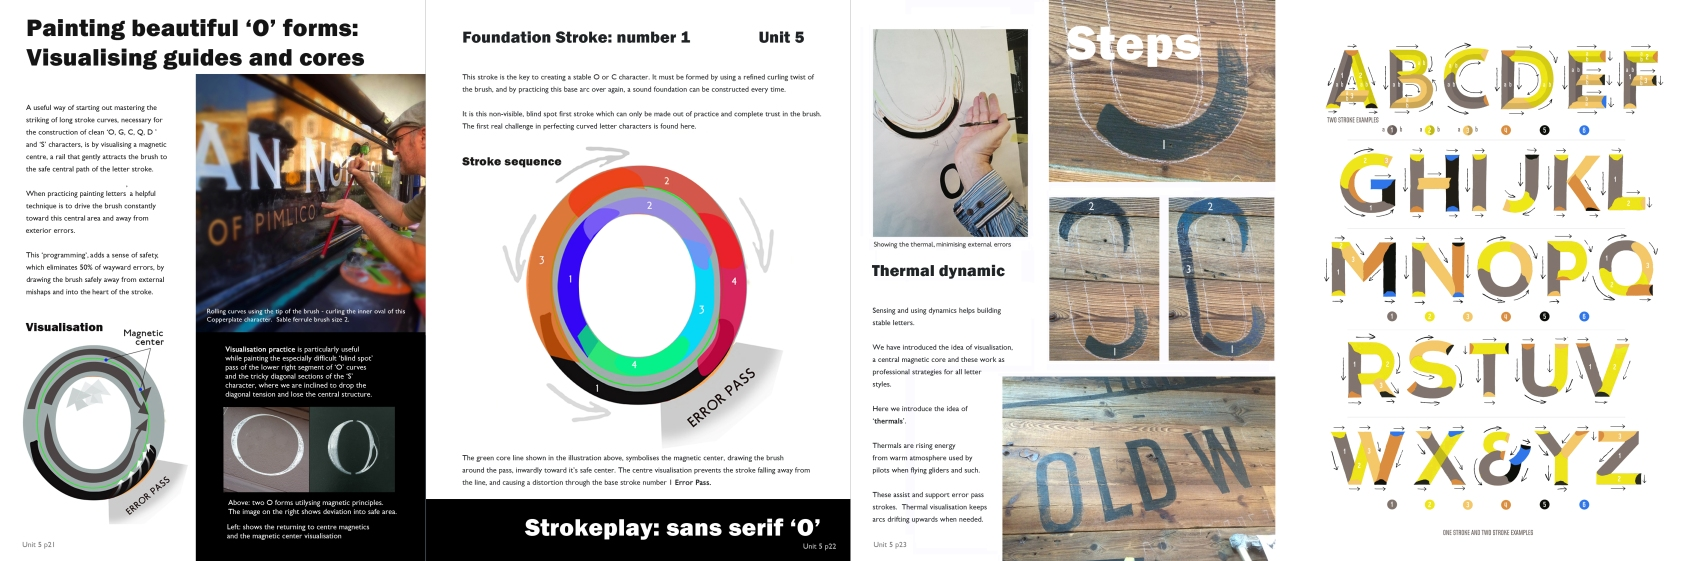 Painting O forms - Sans serif.jpg